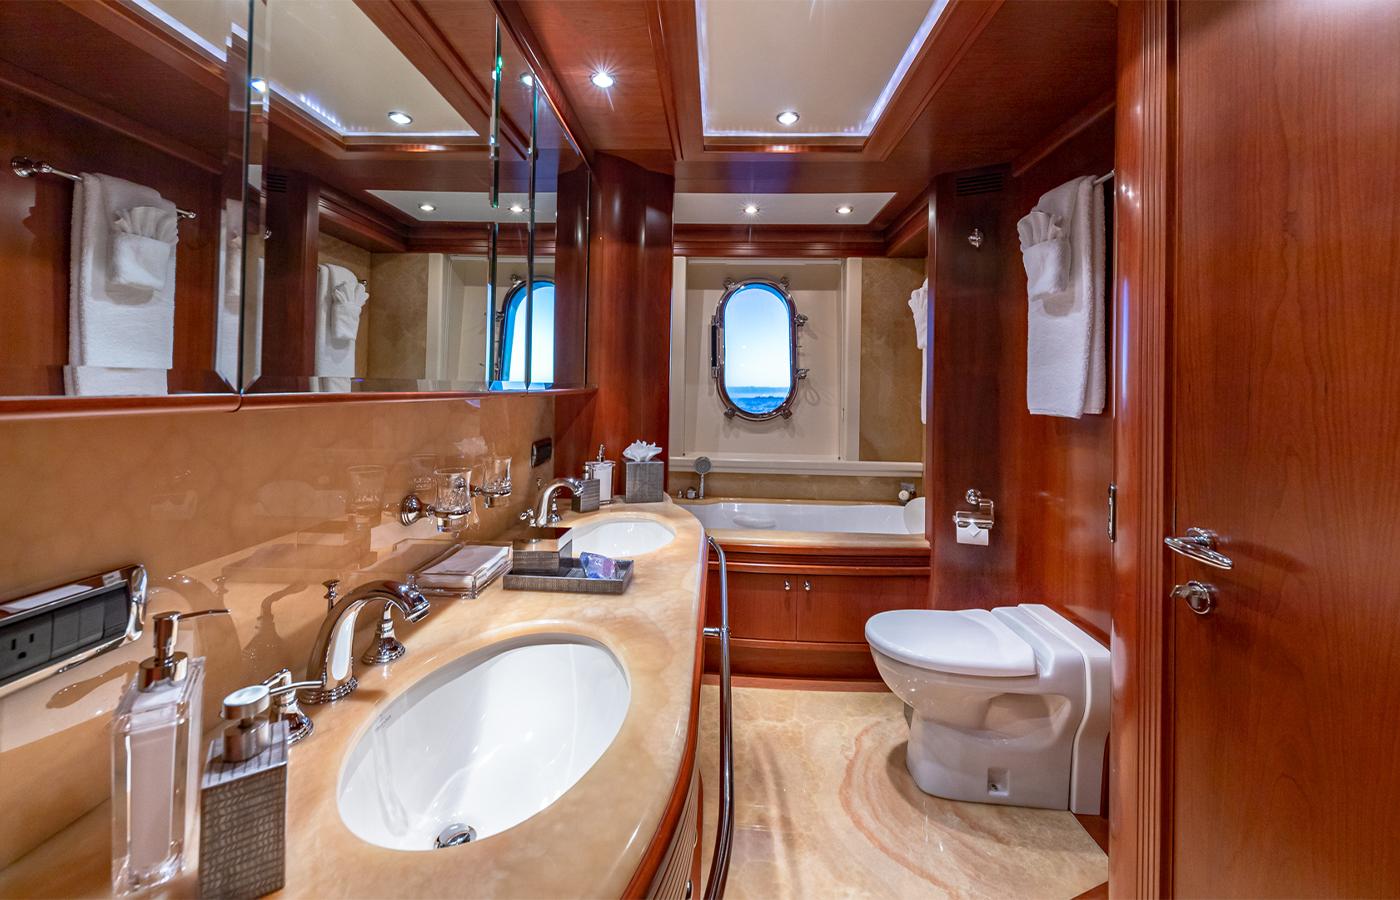 Luxury Yacht Charter: SWEET EMOCEAN | 116' Azimut 2009/2019 - photo 7